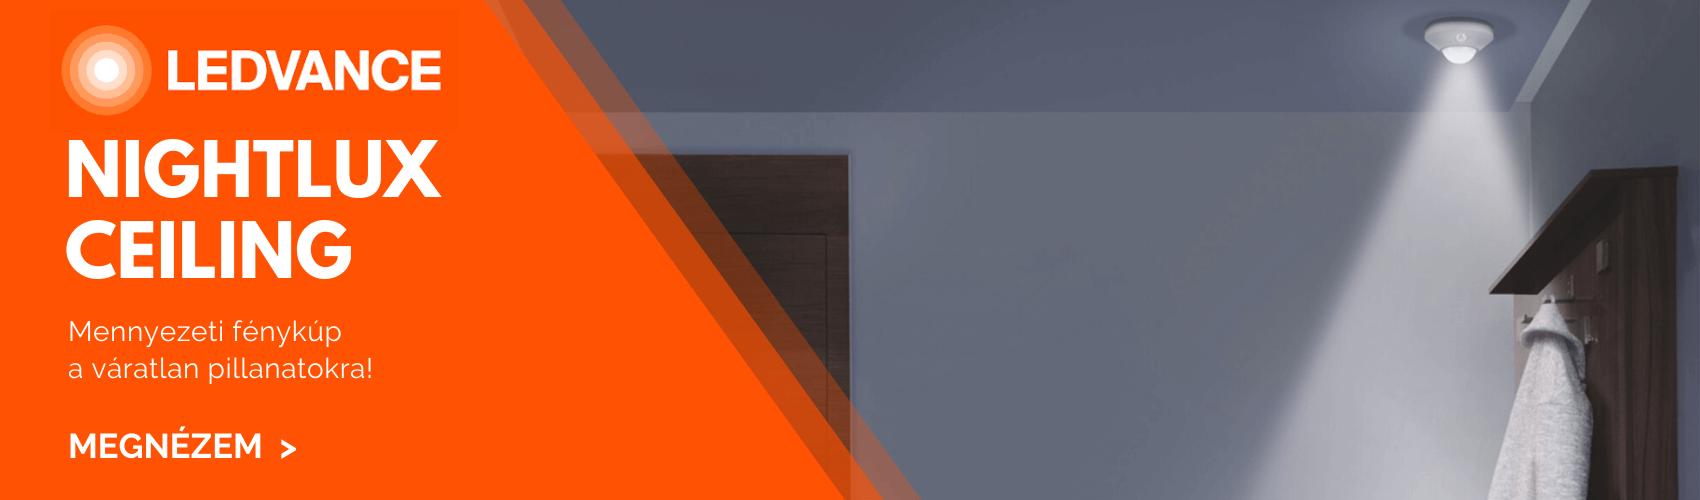 Ledvance Nightlux Stair